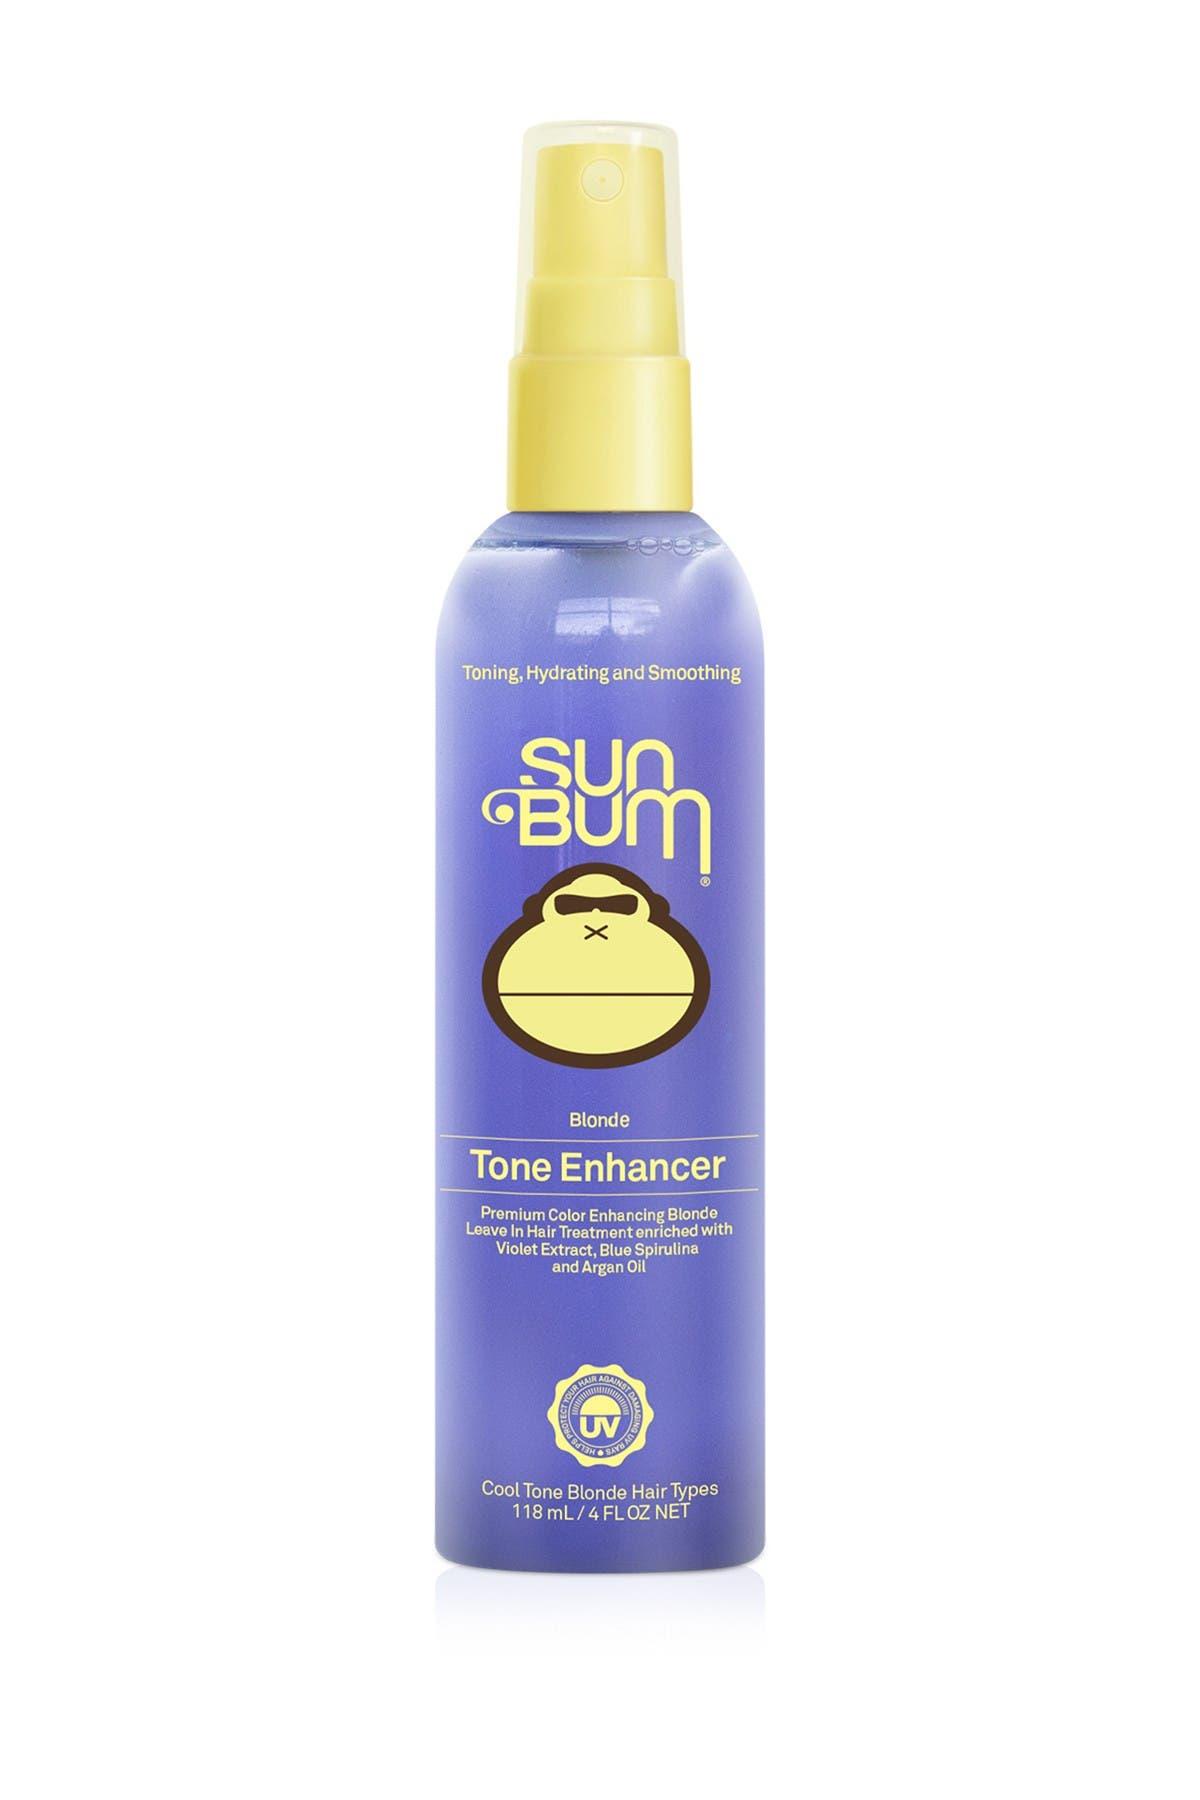 Image of Sun Bum Blonde Tone Enhancer